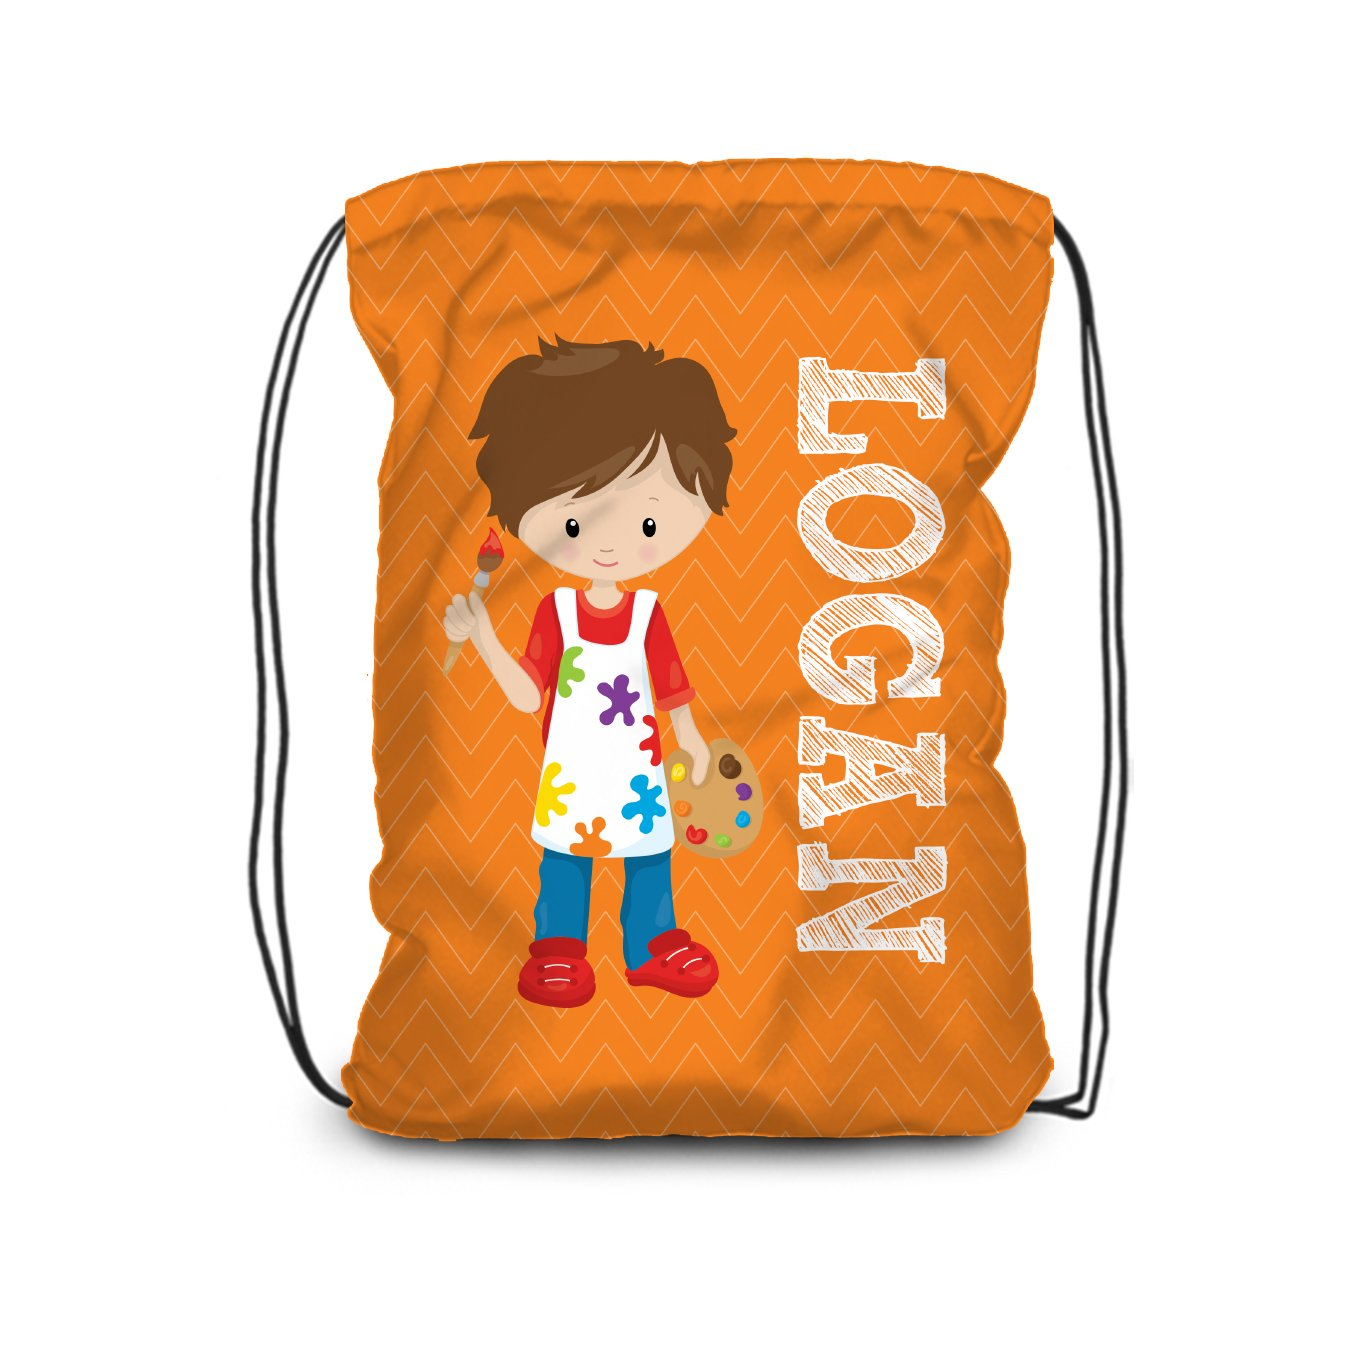 Art Drawstring Backpack - Cheap bargain Orange Artist Name Boy Memphis Mall Ba Personalized